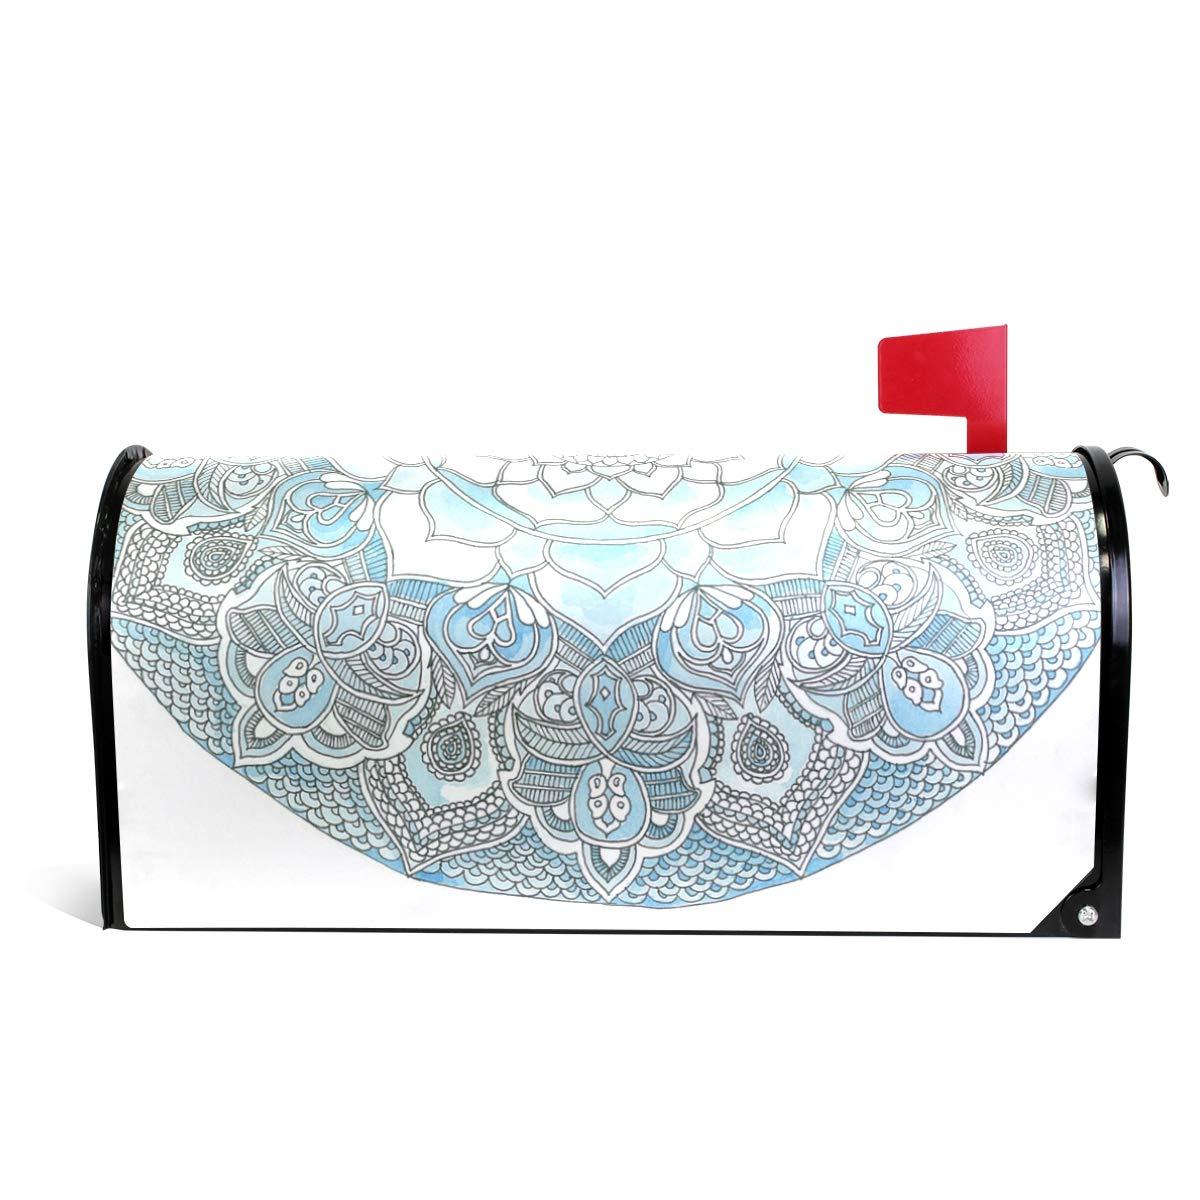 Chu warm Mailbox Covers Magnetic Abstract Light Blue Mandala Standard Size